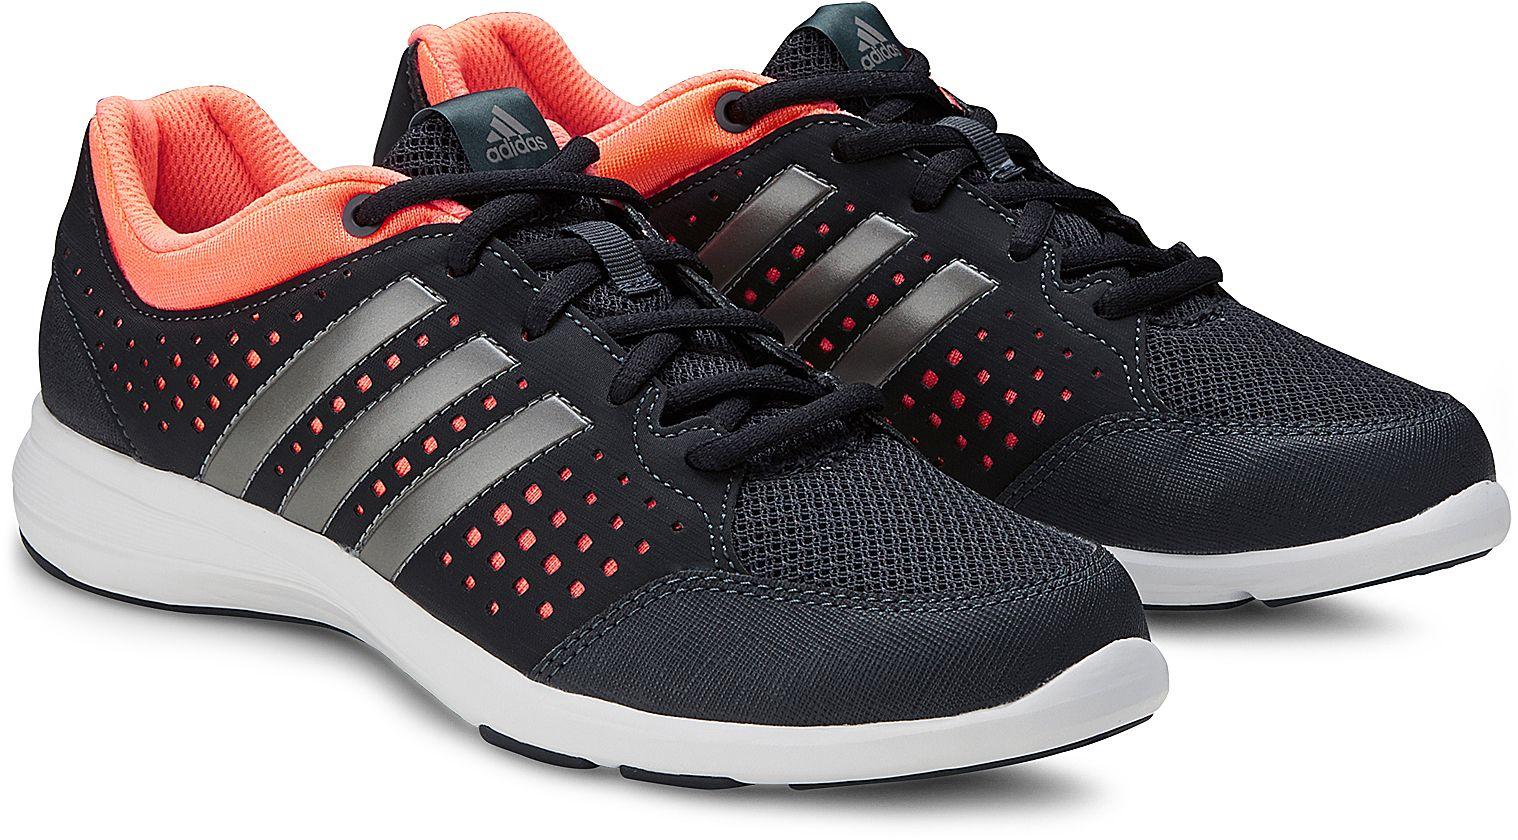 Beliebt Adidas Adilette Athletic Personalisiert Schuhe